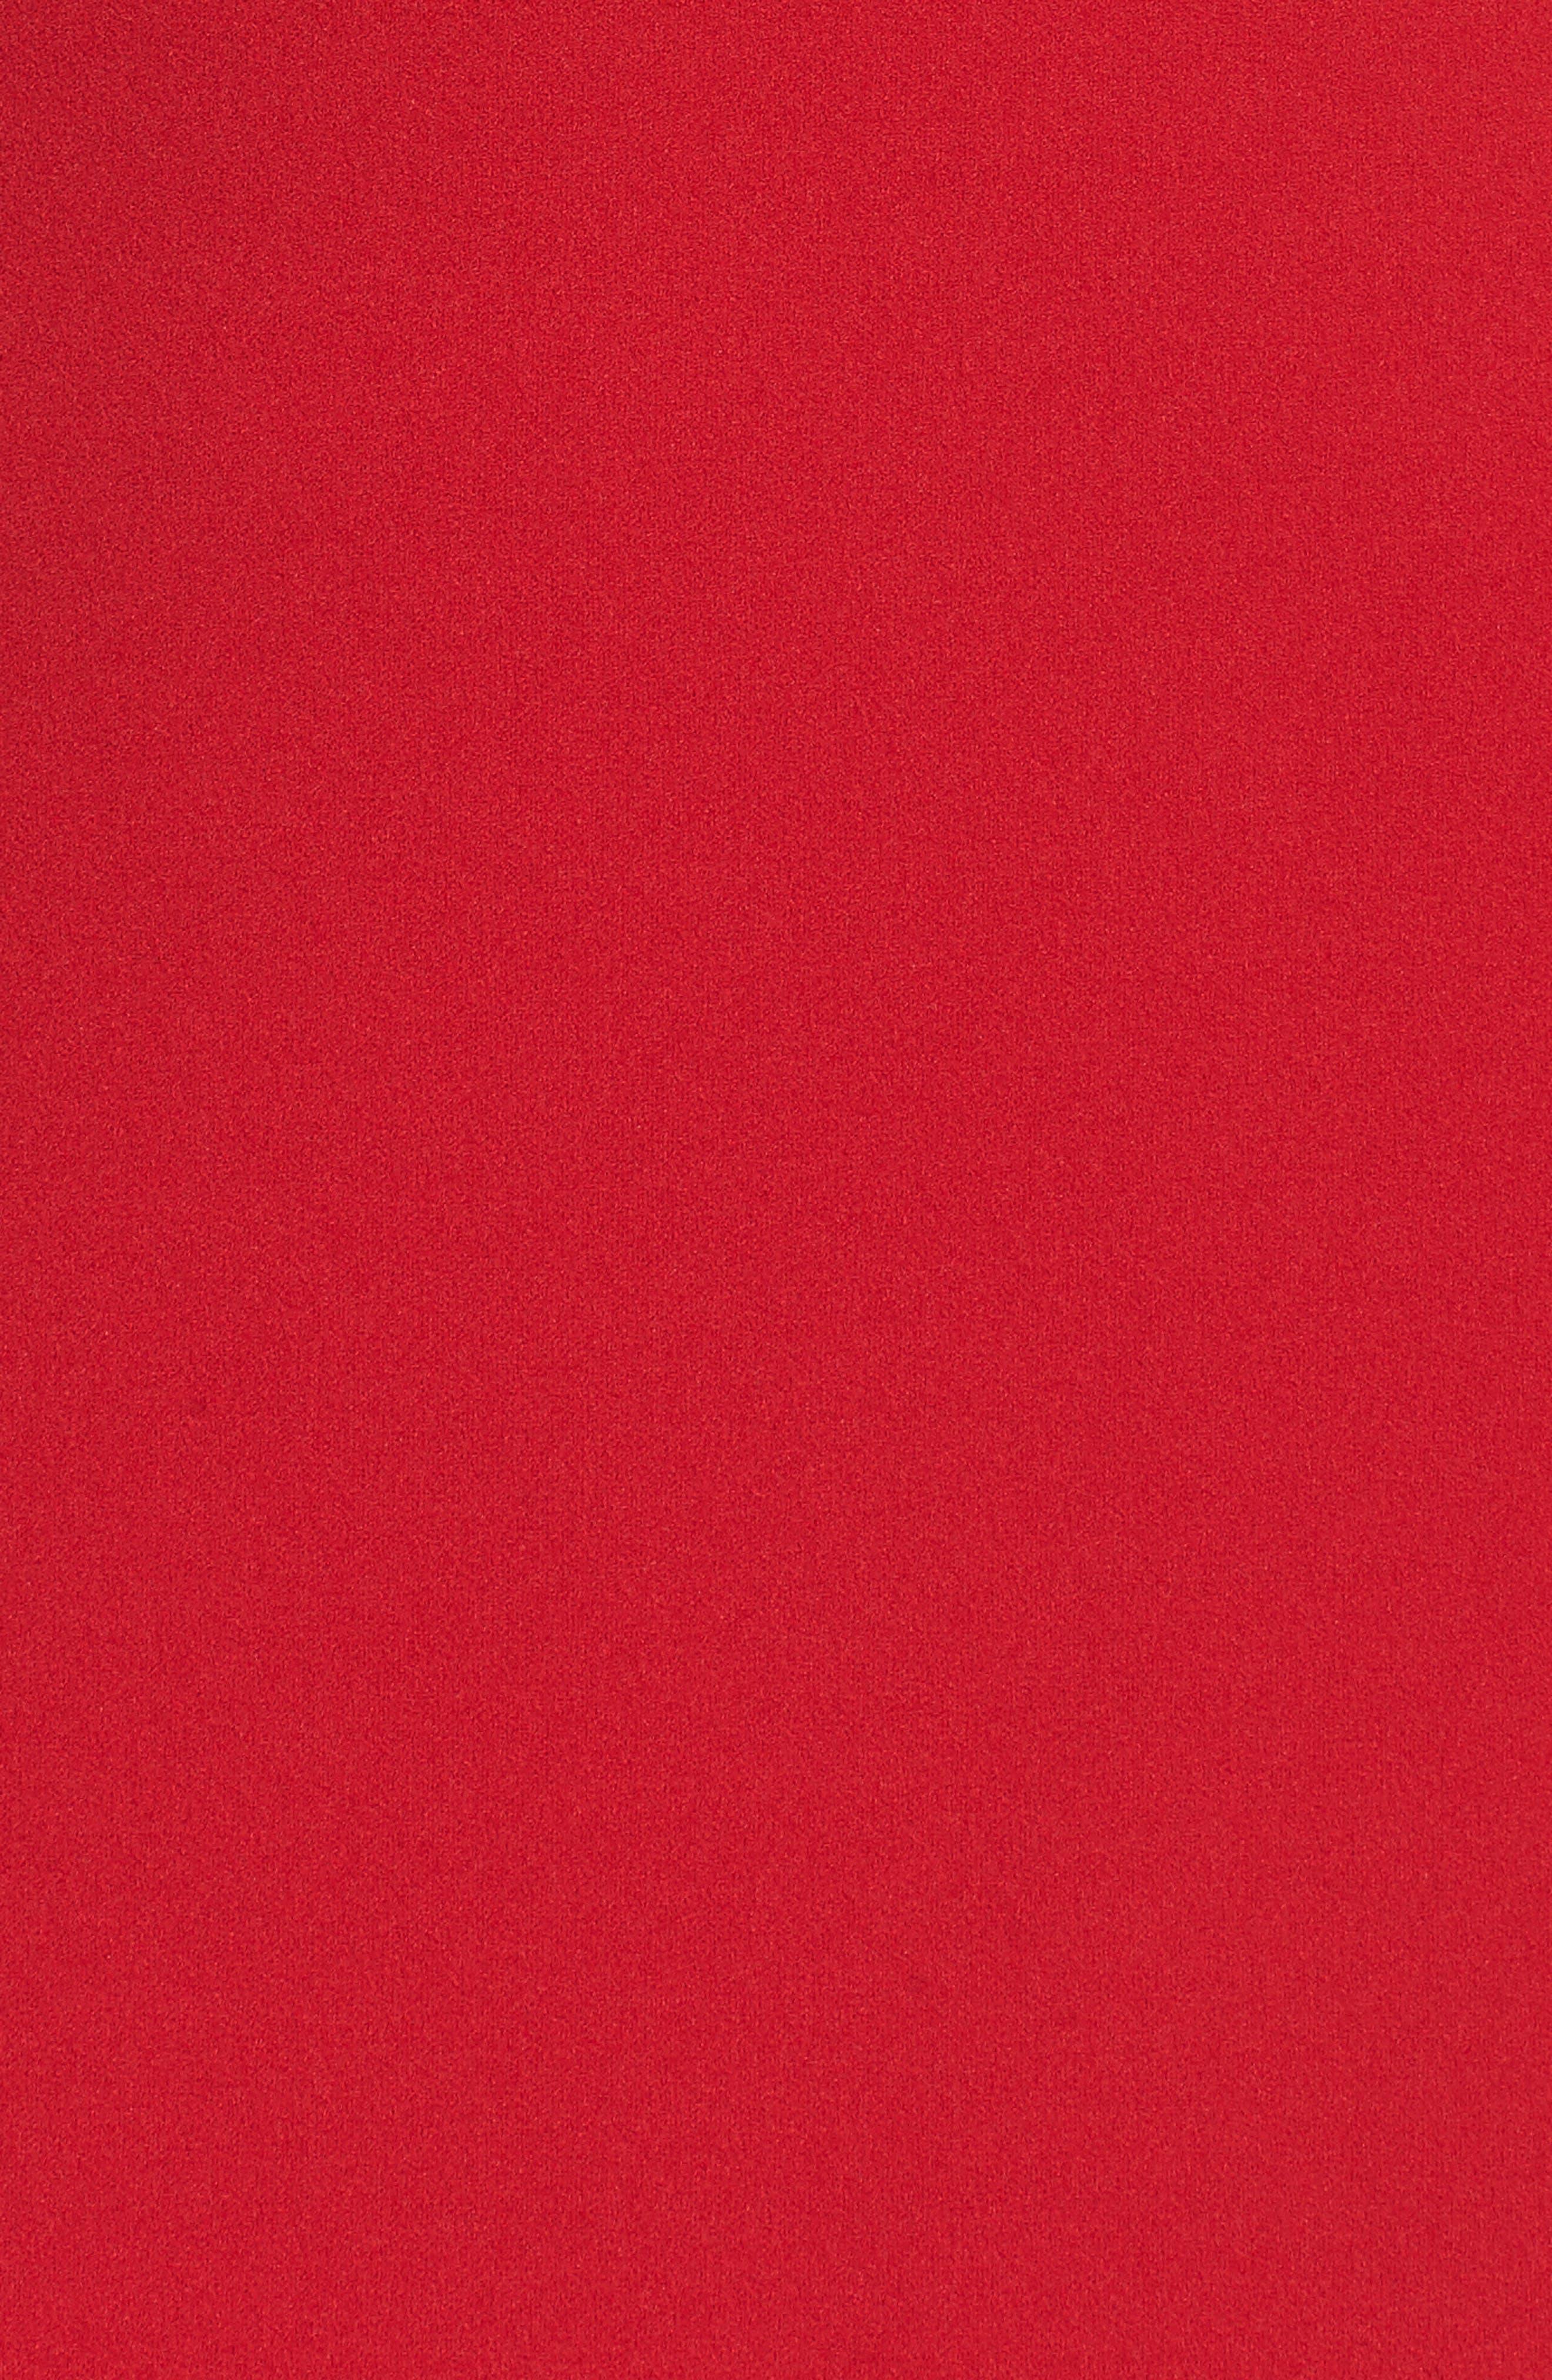 Bell Sleeve Sheath Dress,                             Alternate thumbnail 5, color,                             Apple Red